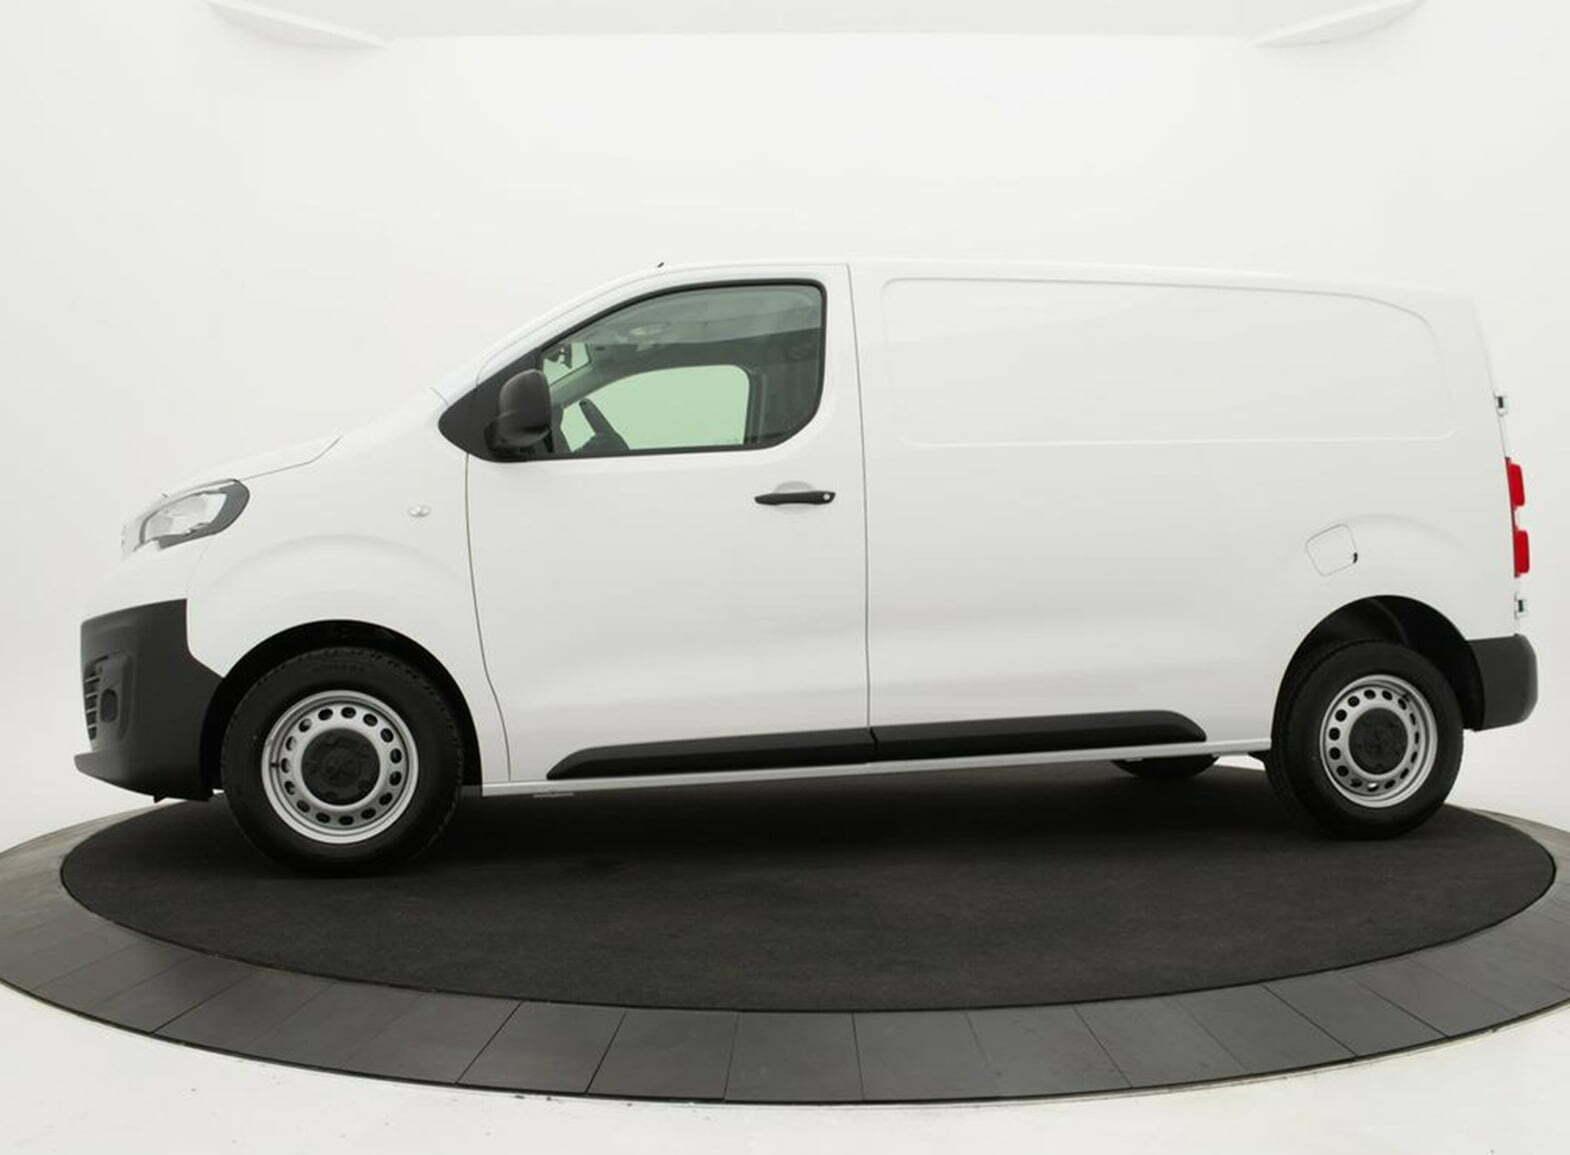 Peugeot Expert Premium Standaard 2.0 BlueHDi 120 pk 6-bak 4d.